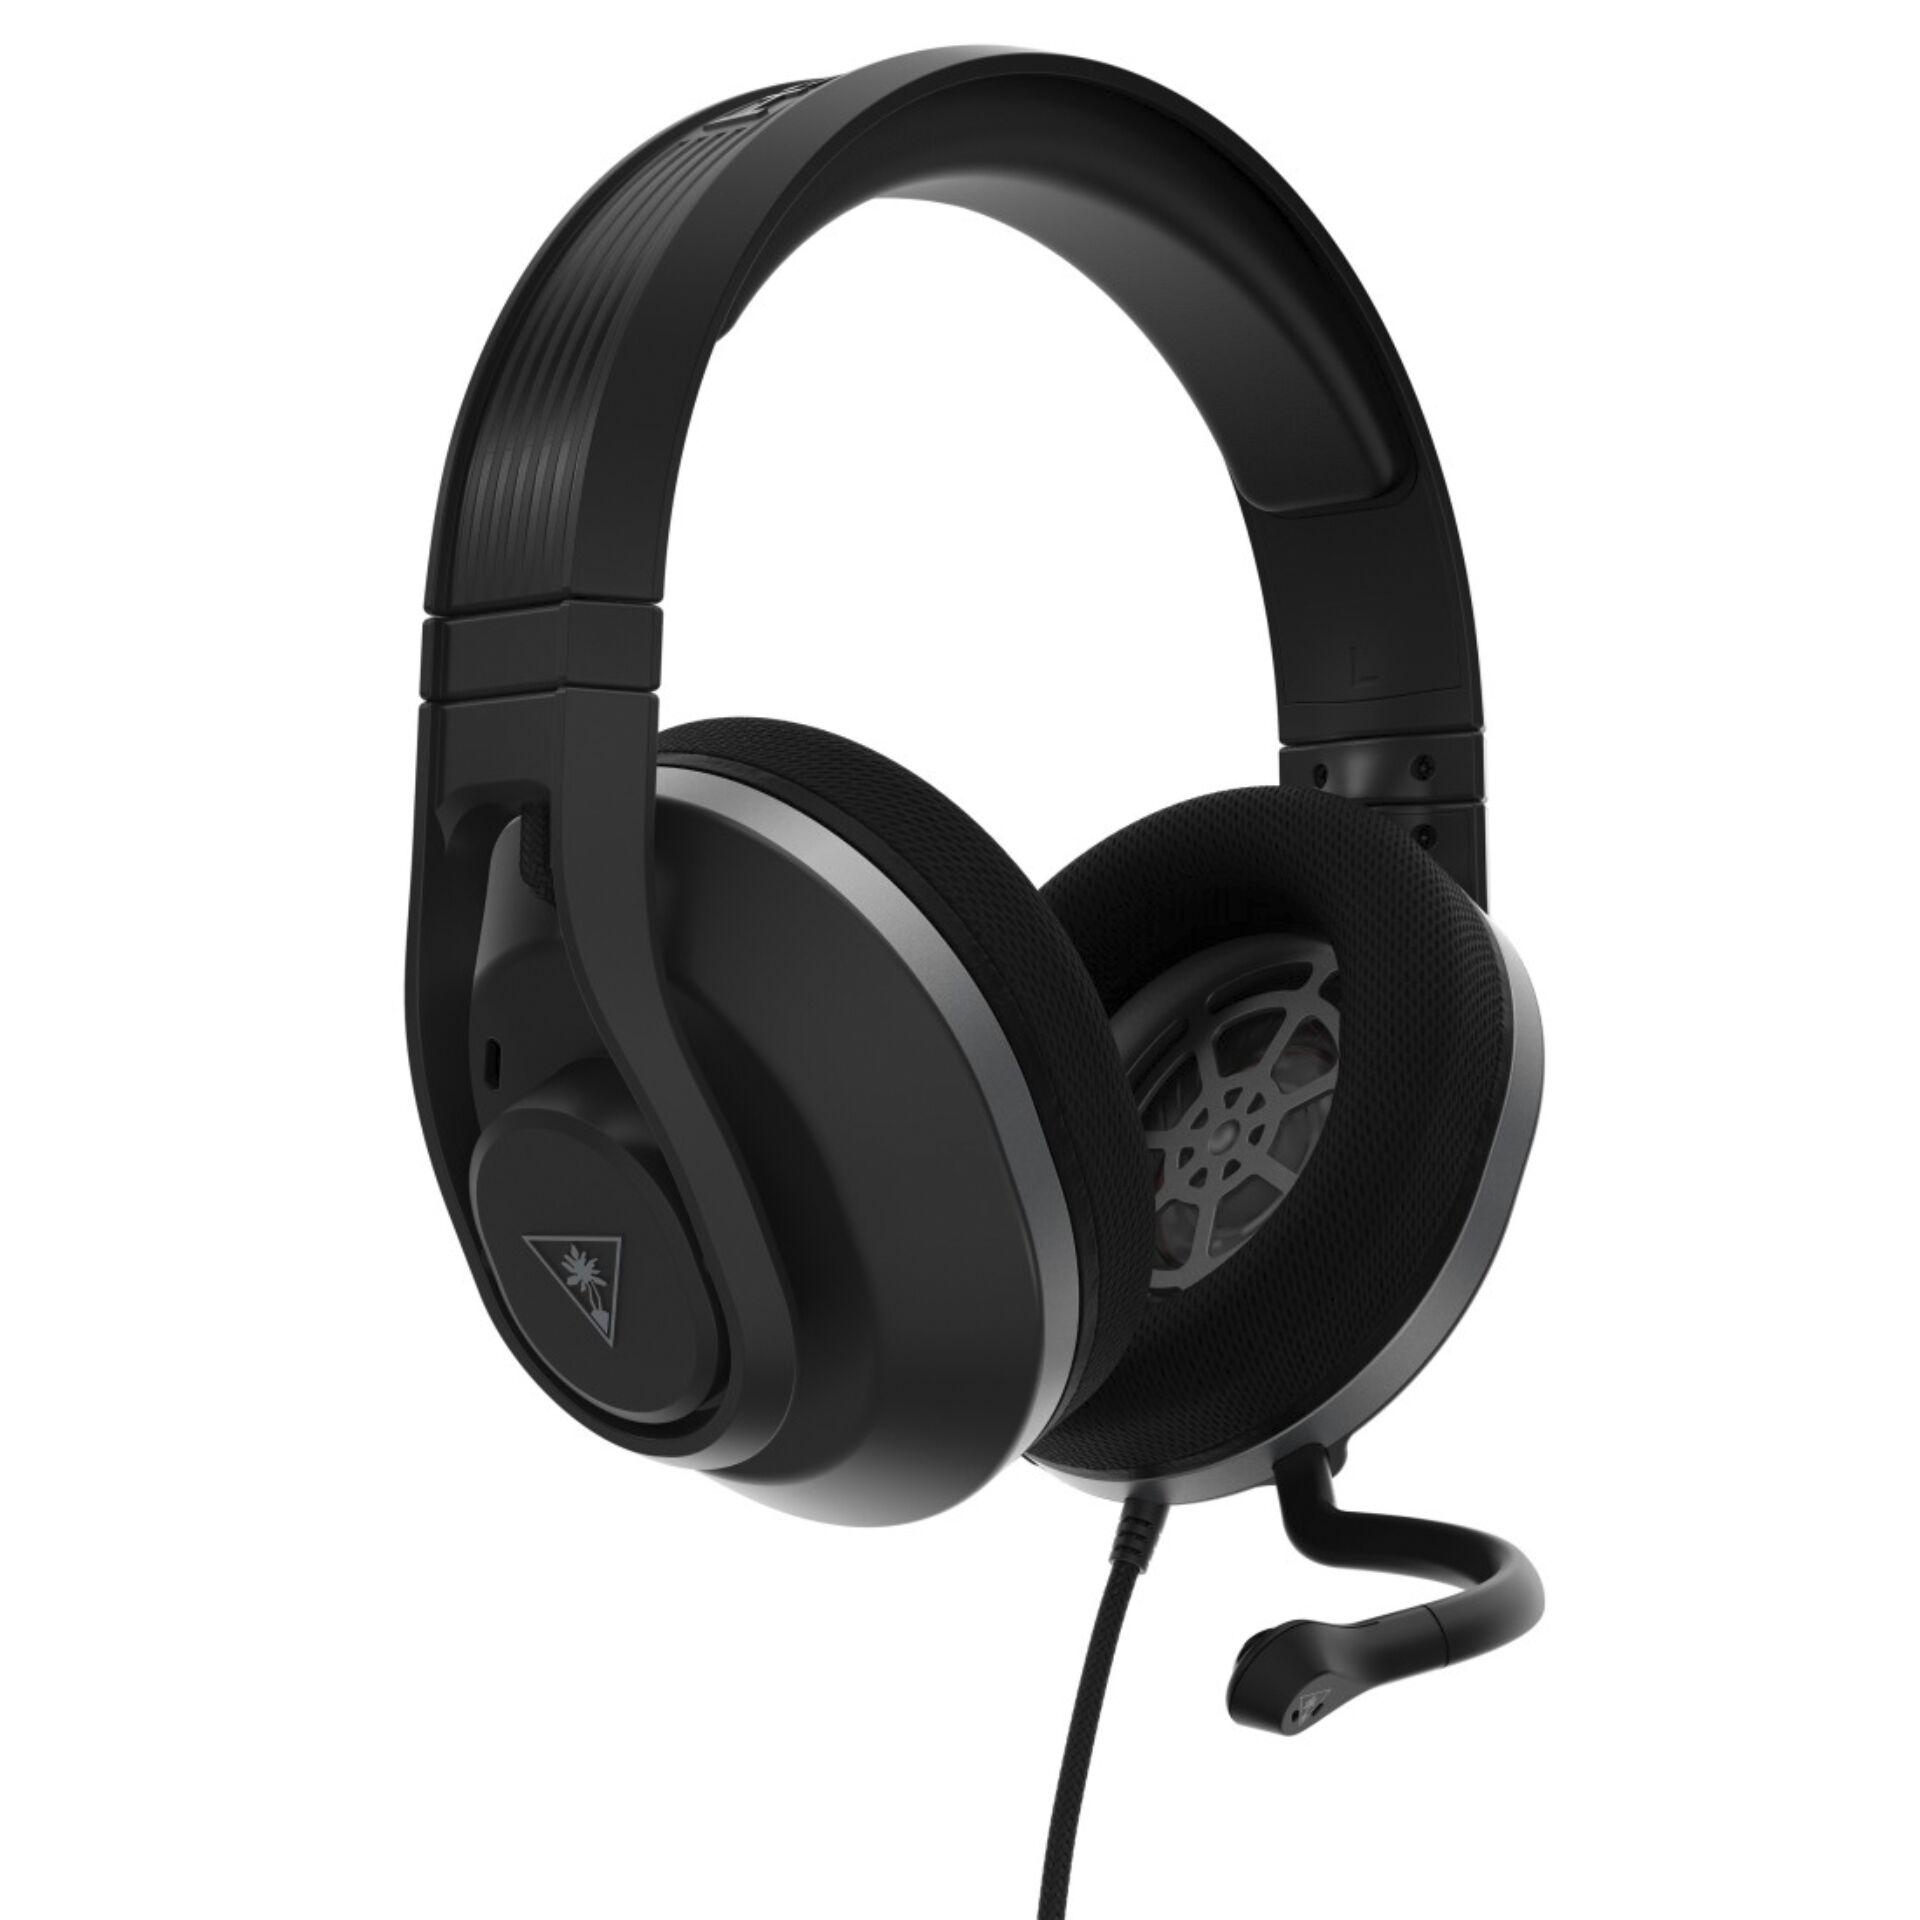 Turtle Beach Recon 500 Gaming Headset Black